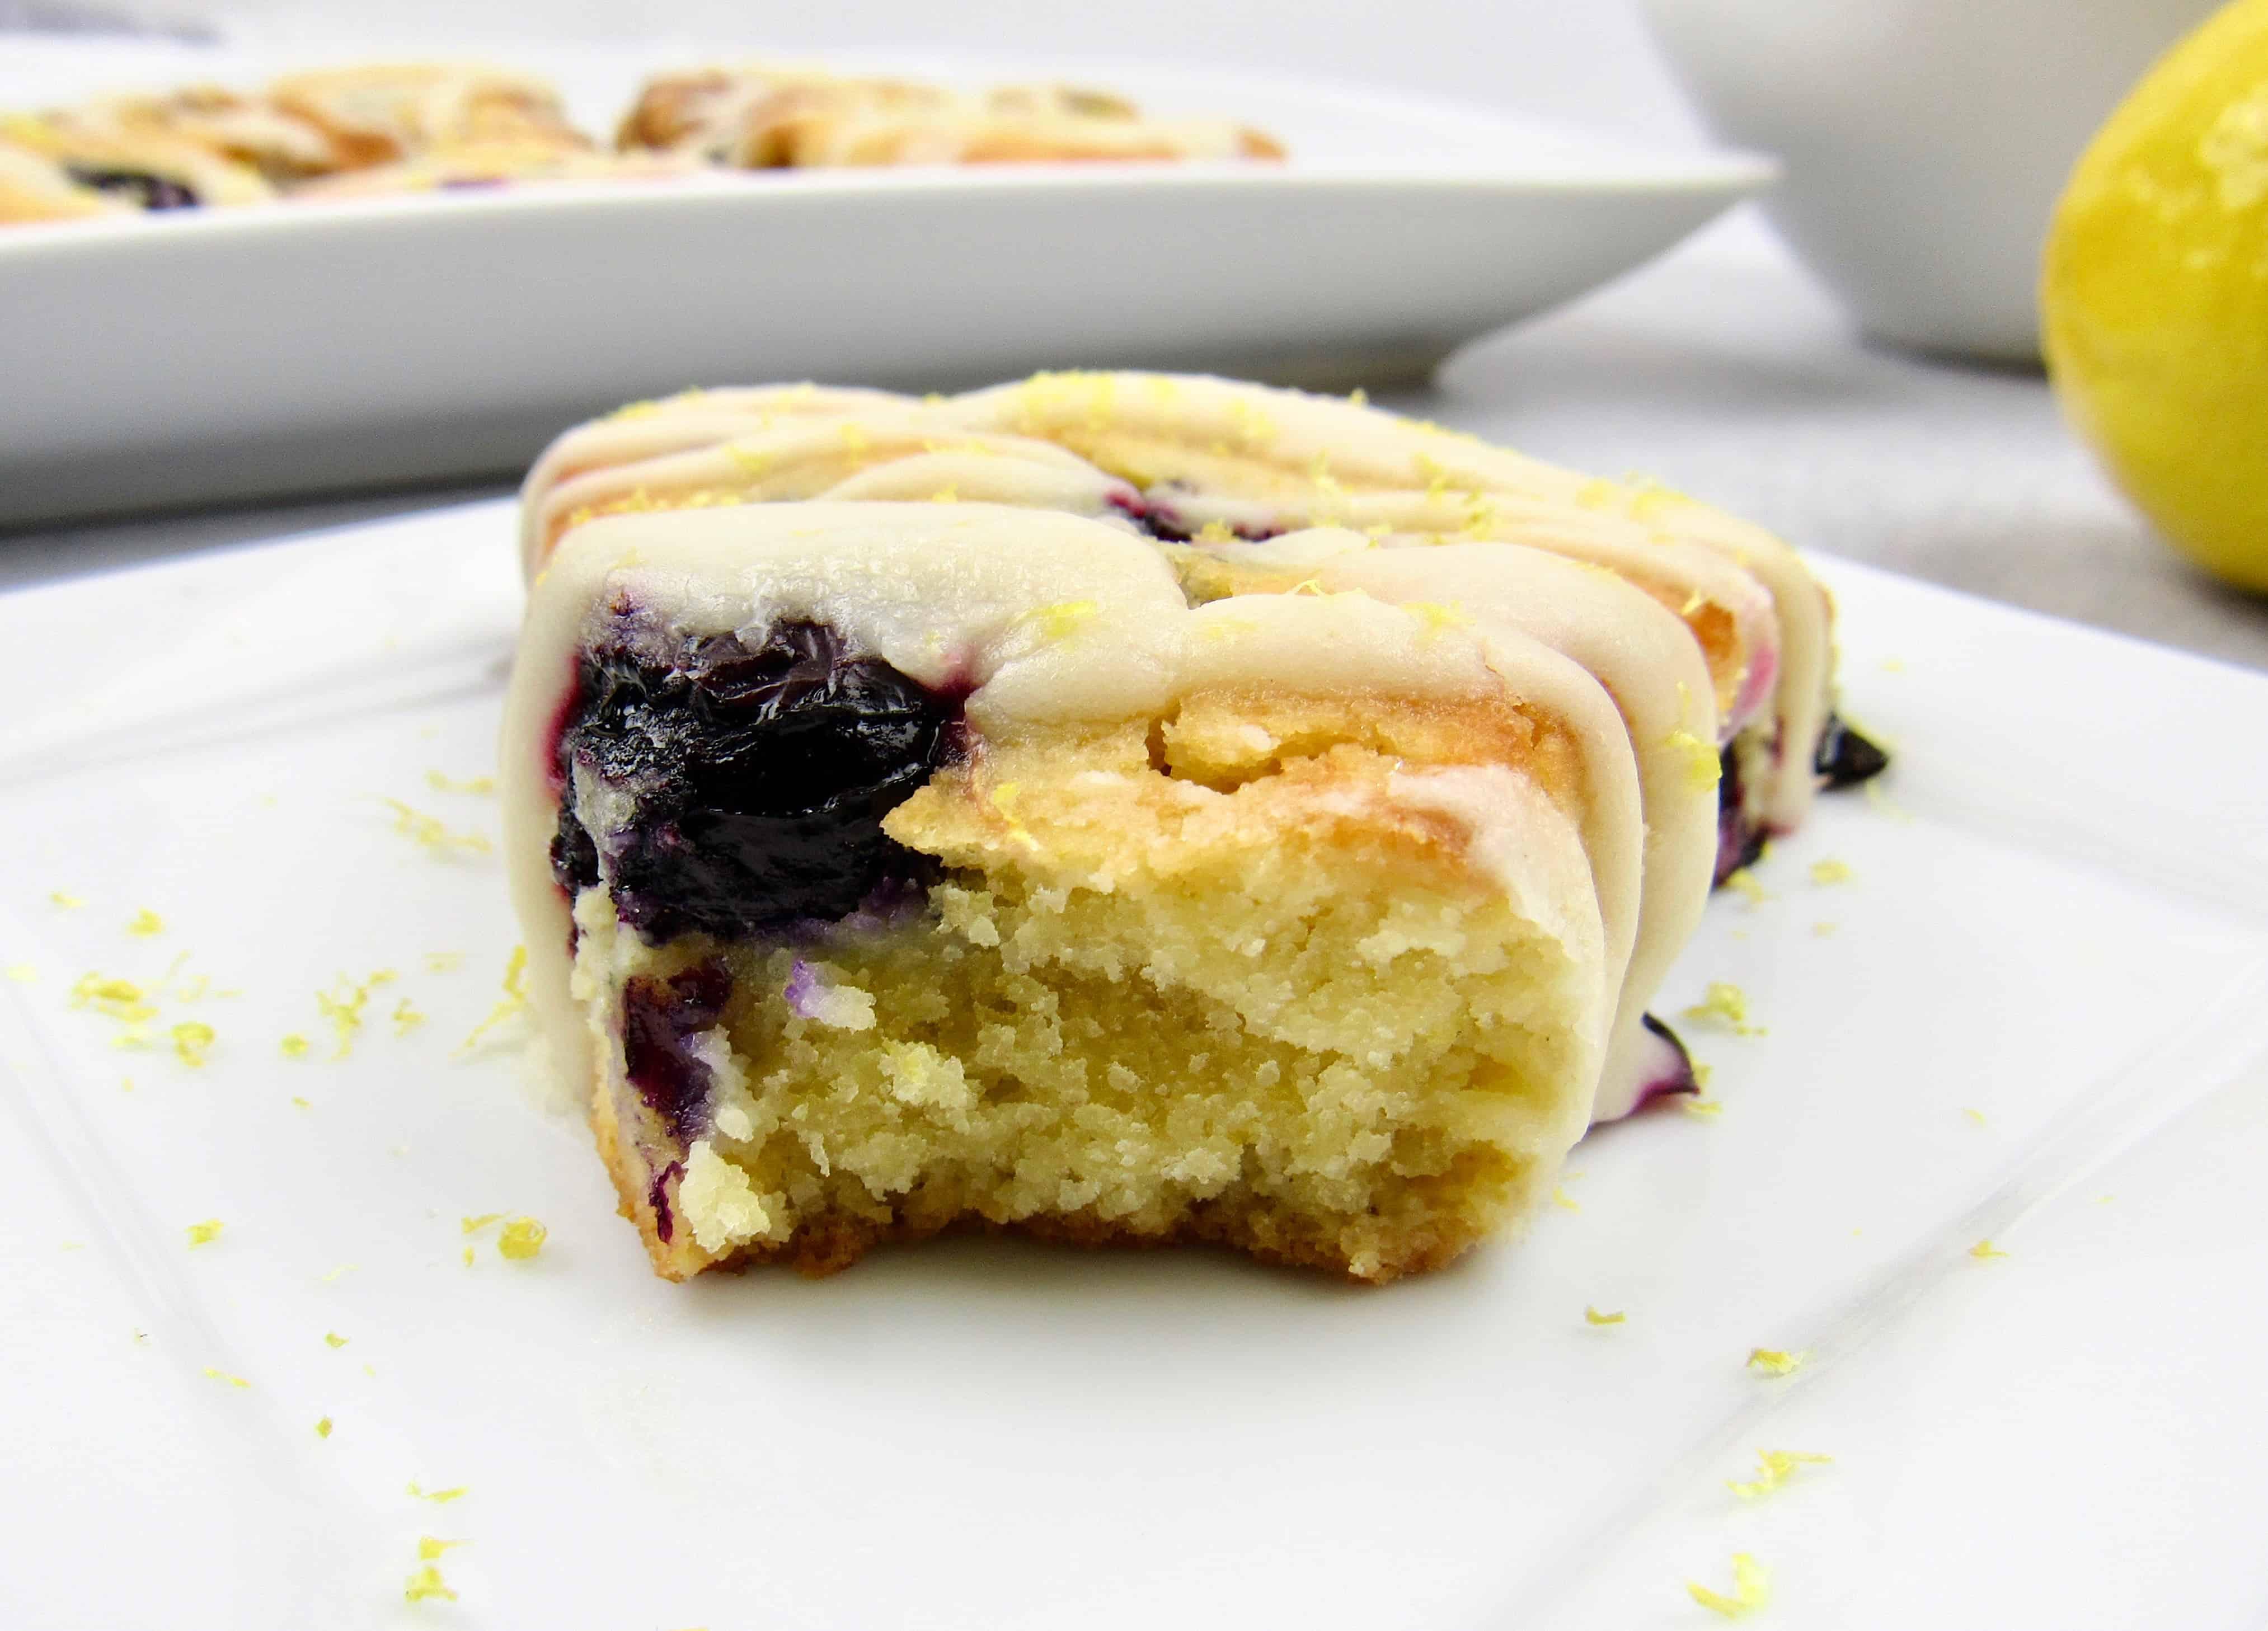 closeup of cut open blueberry lemon scone